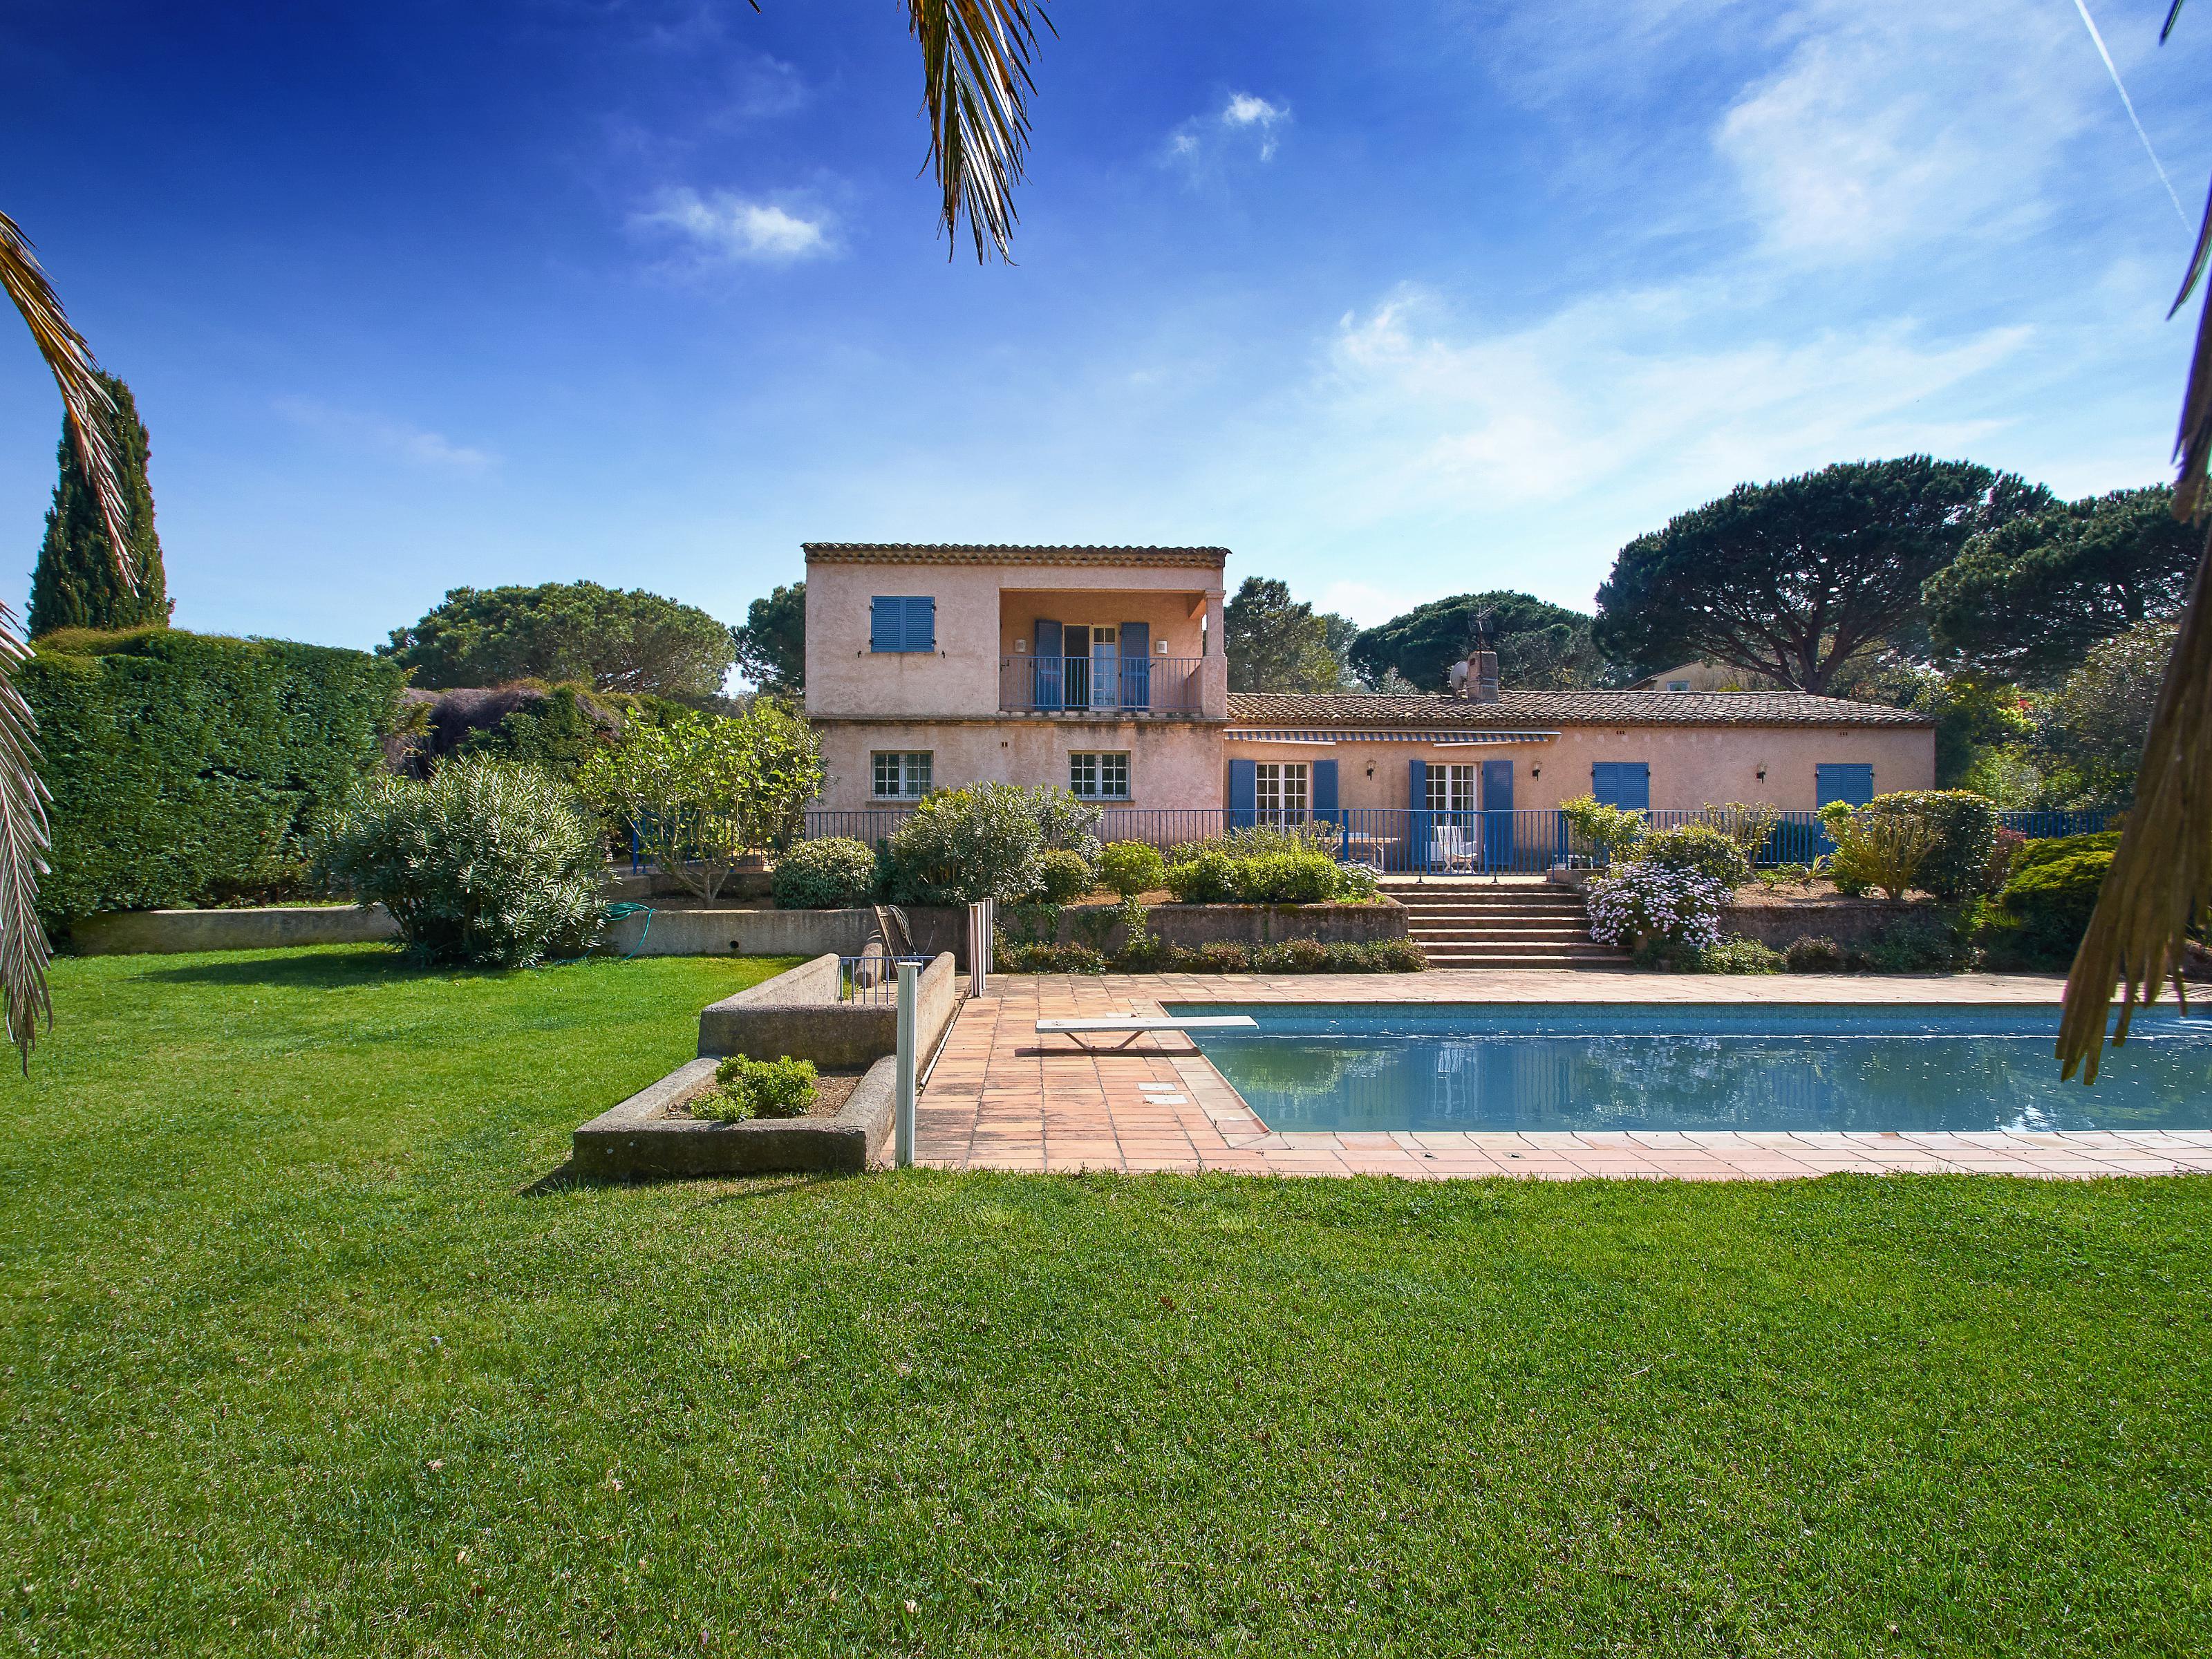 Single Family Home for Sale at Provencal property near the Salins Beach Saint Tropez, Provence-Alpes-Cote D'Azur 83990 France